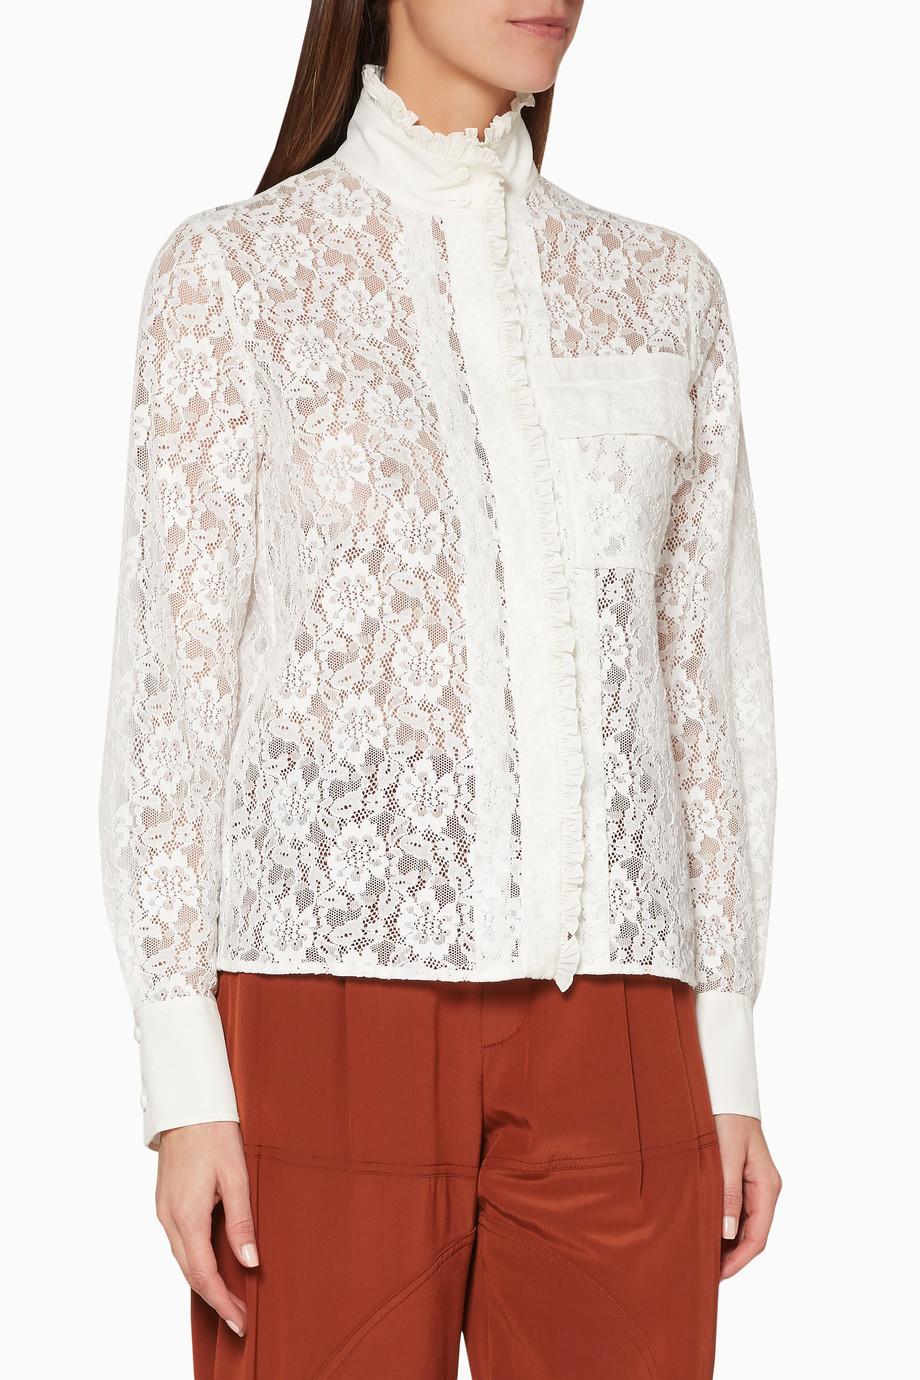 8c84fc60b9c17f Shop Chloé White White Lace High-Neck Shirt for Women   Ounass UAE